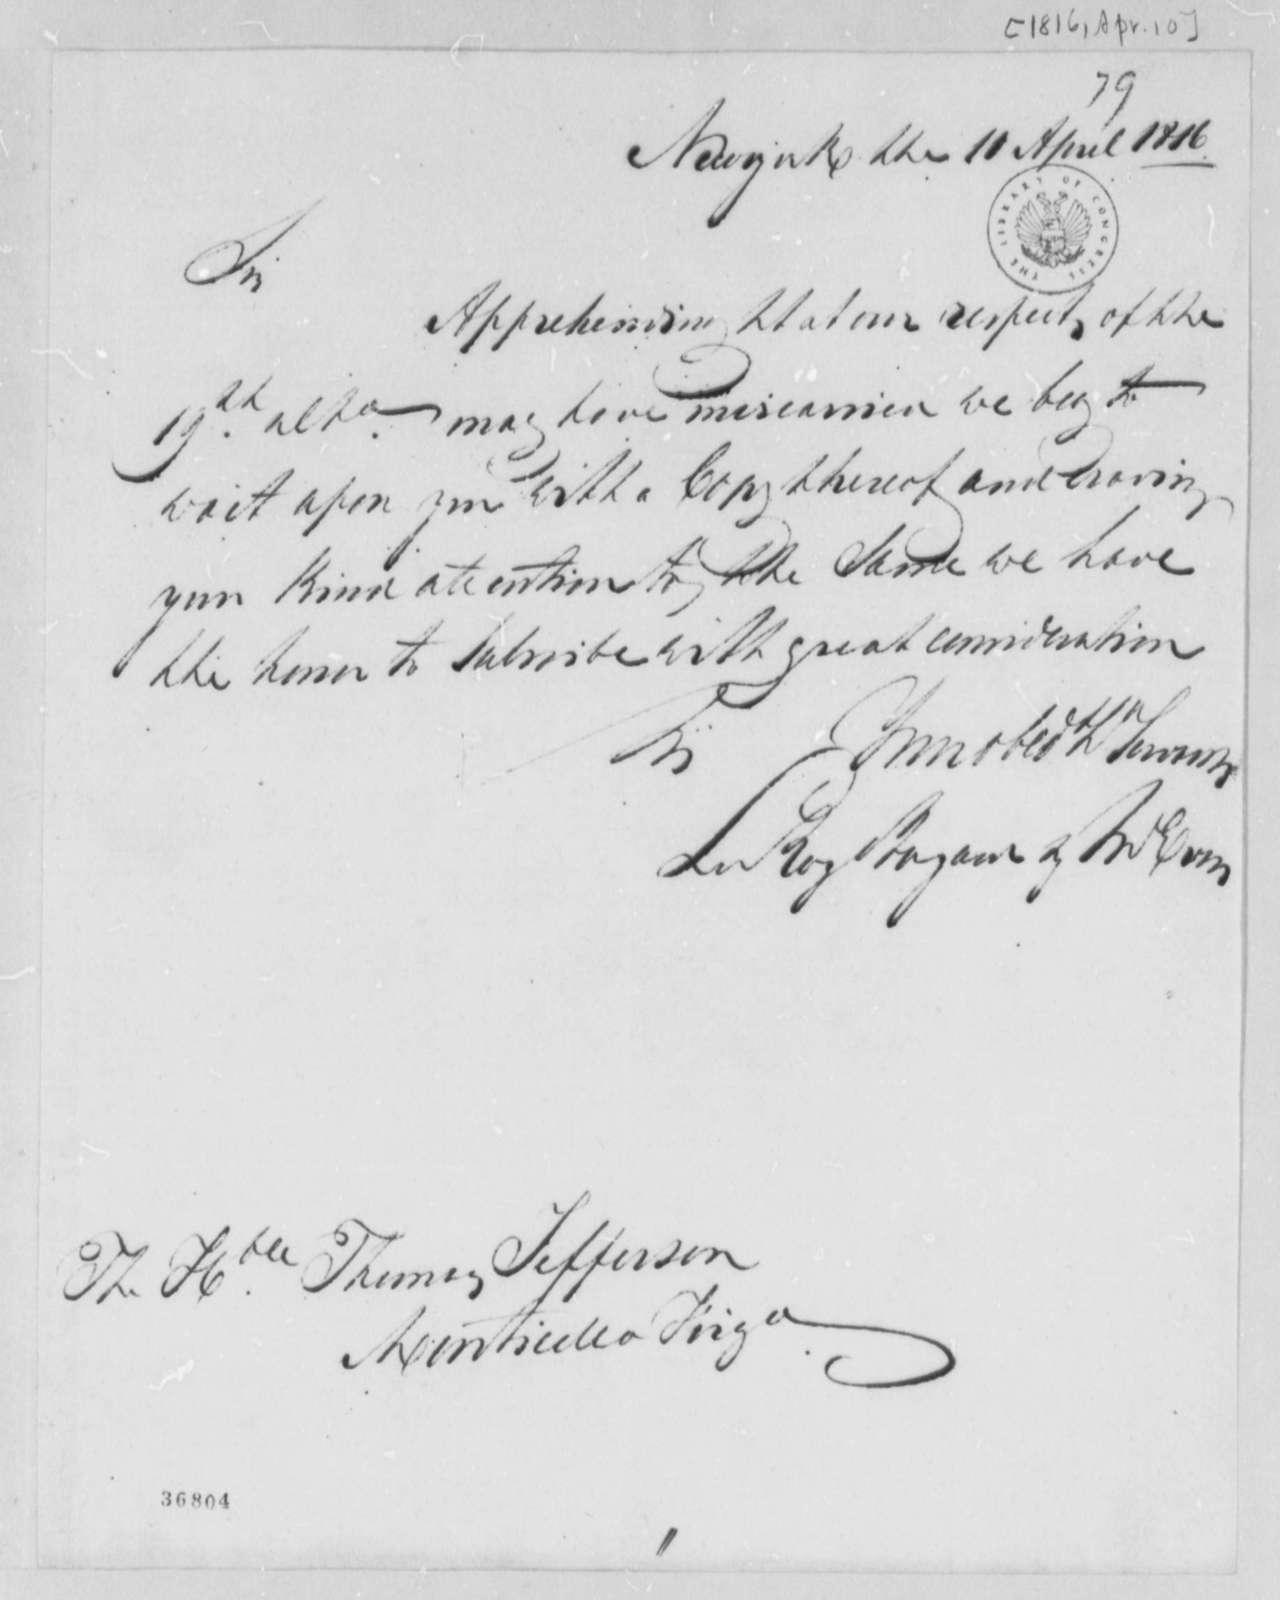 Leroy-Bayard & McCorn to Thomas Jefferson, April 10, 1816